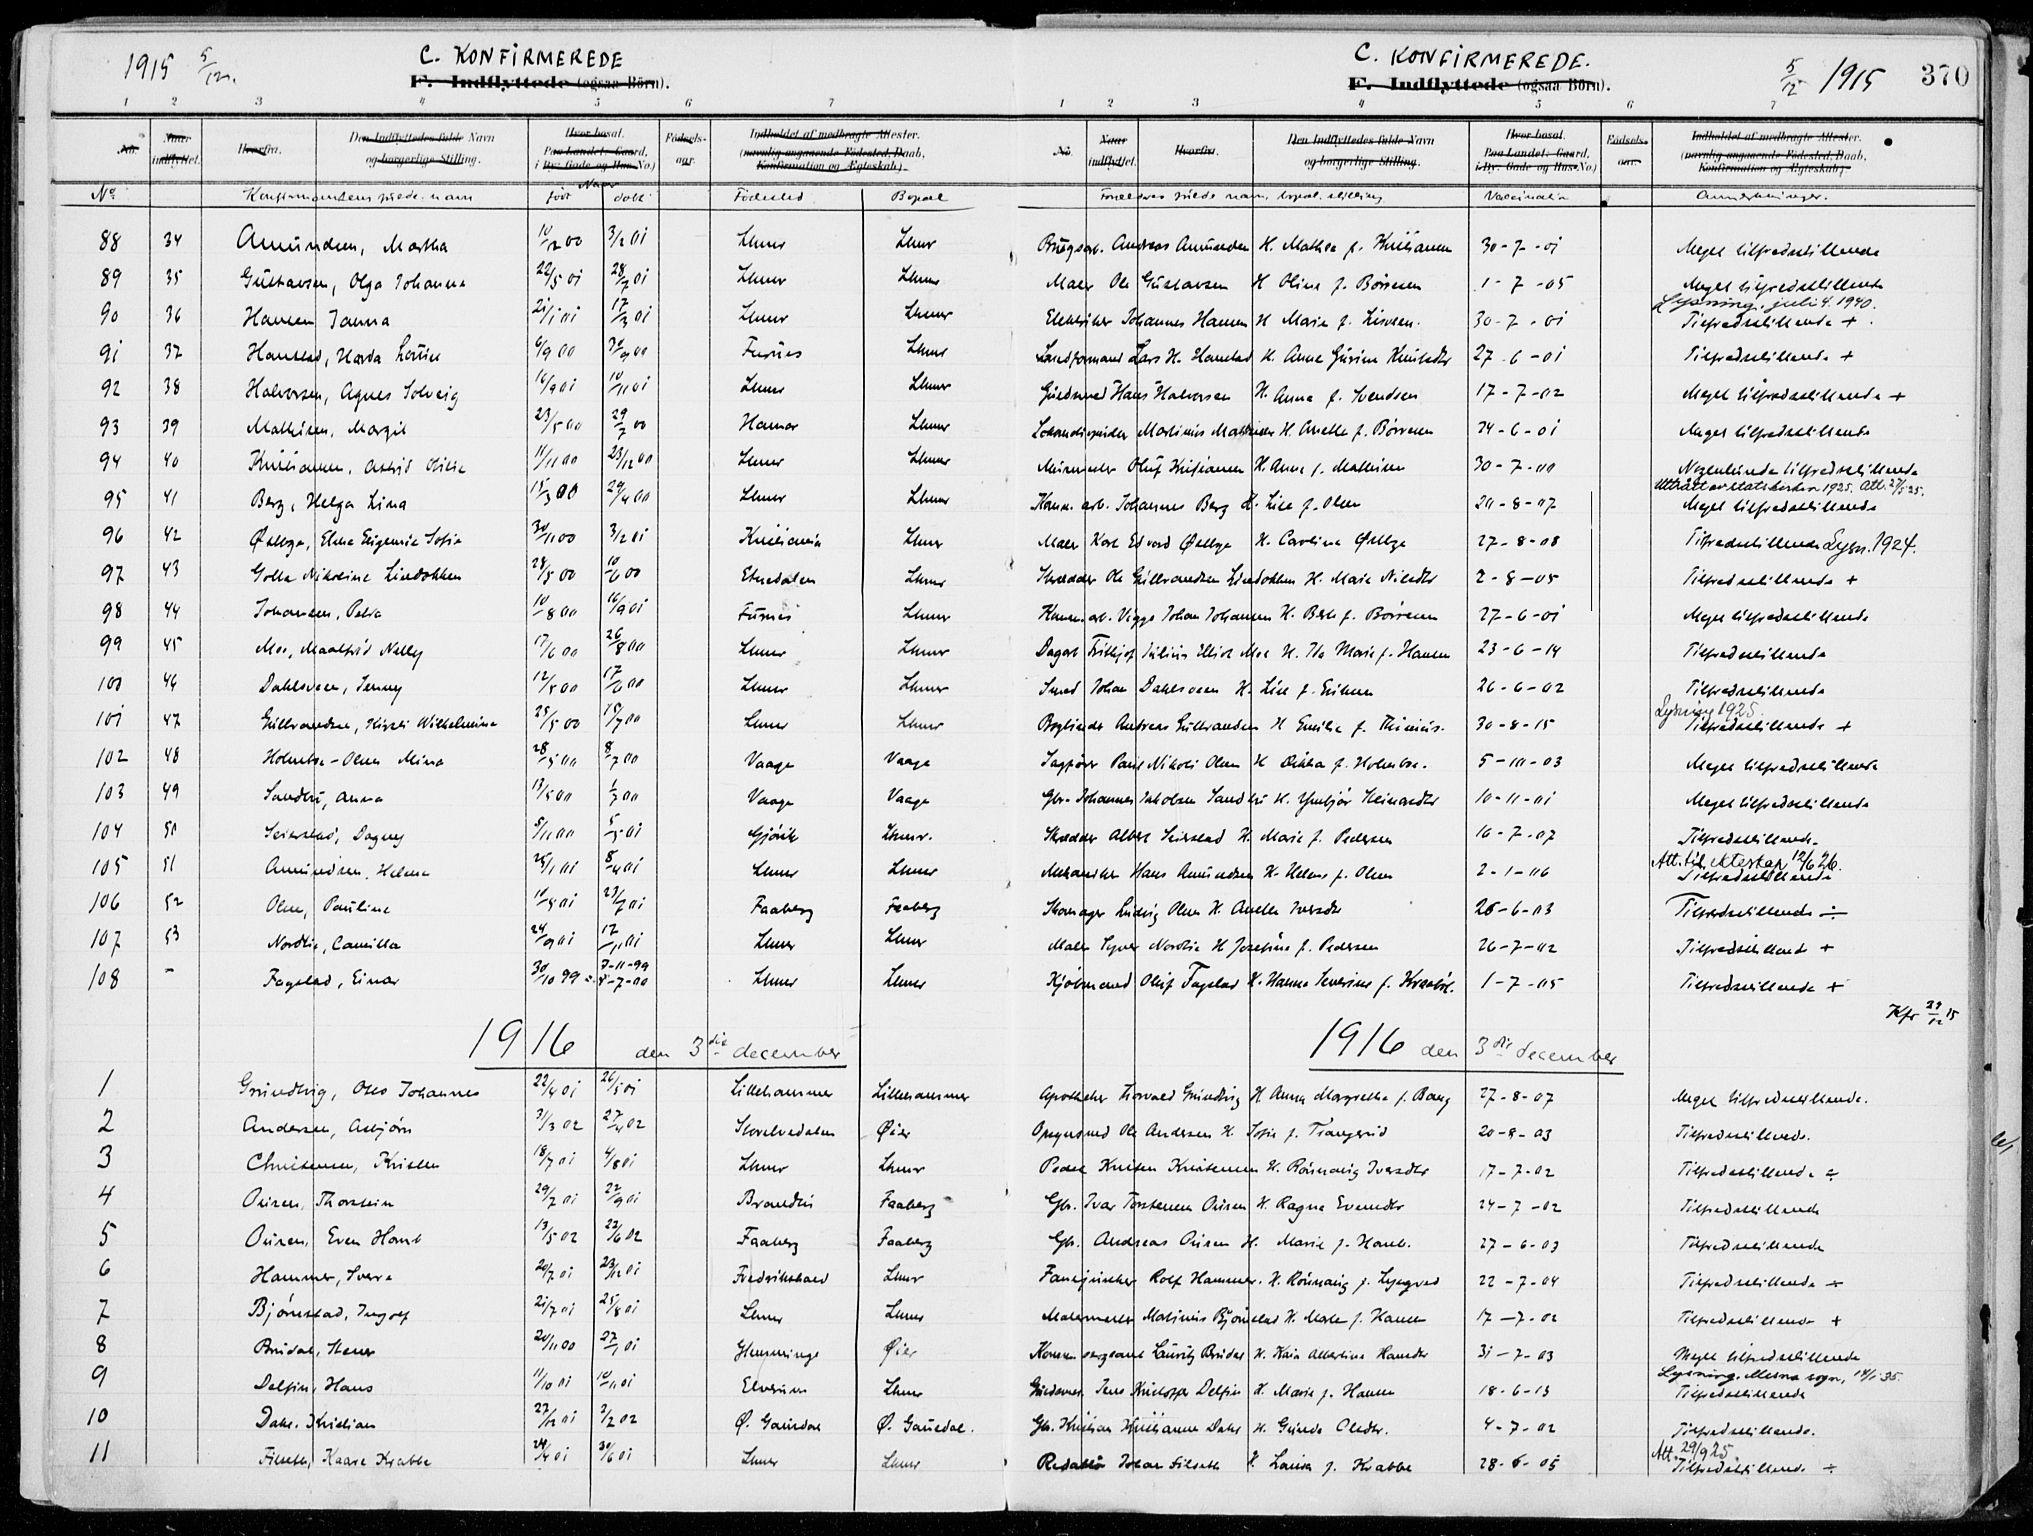 SAH, Lillehammer prestekontor, Ministerialbok nr. 1, 1901-1916, s. 370